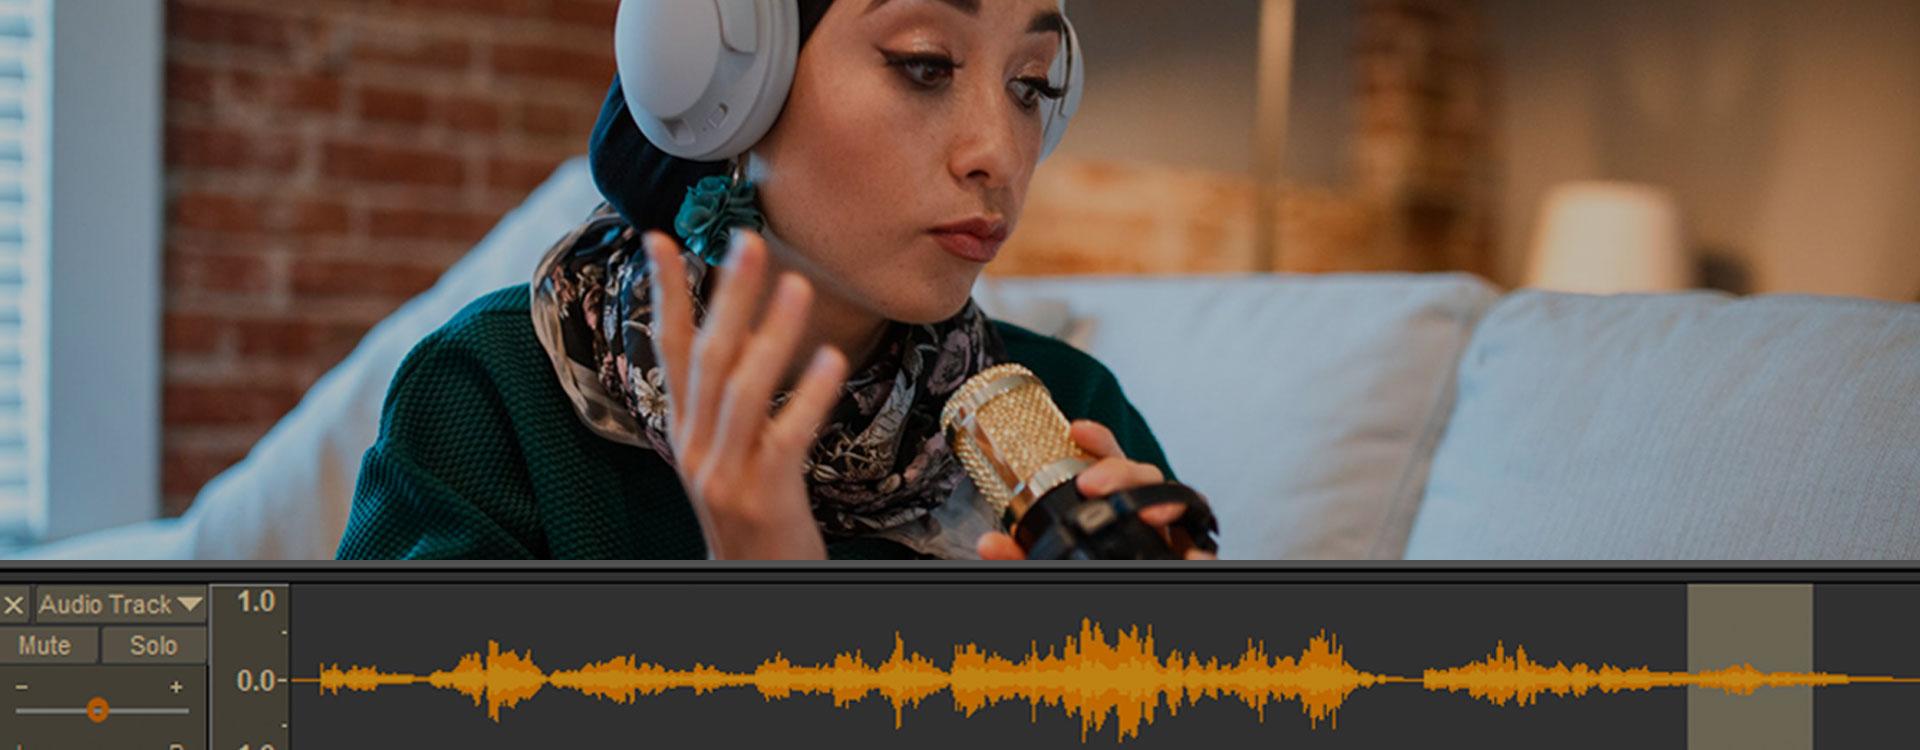 Podcasts en audio editing met Audacity